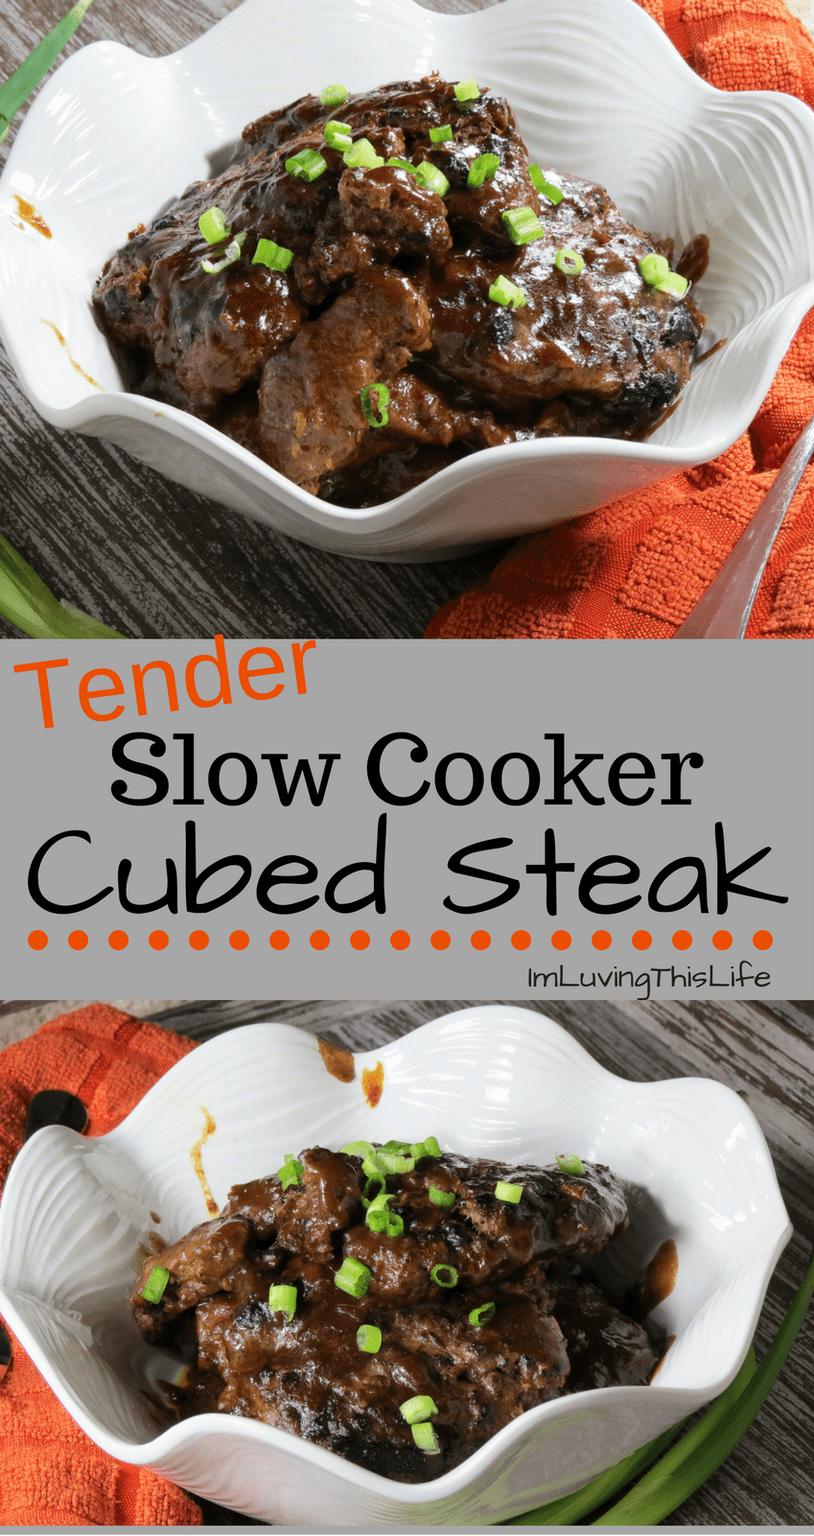 Best Cubed Steak Recipe With Images Cube Steak Recipes